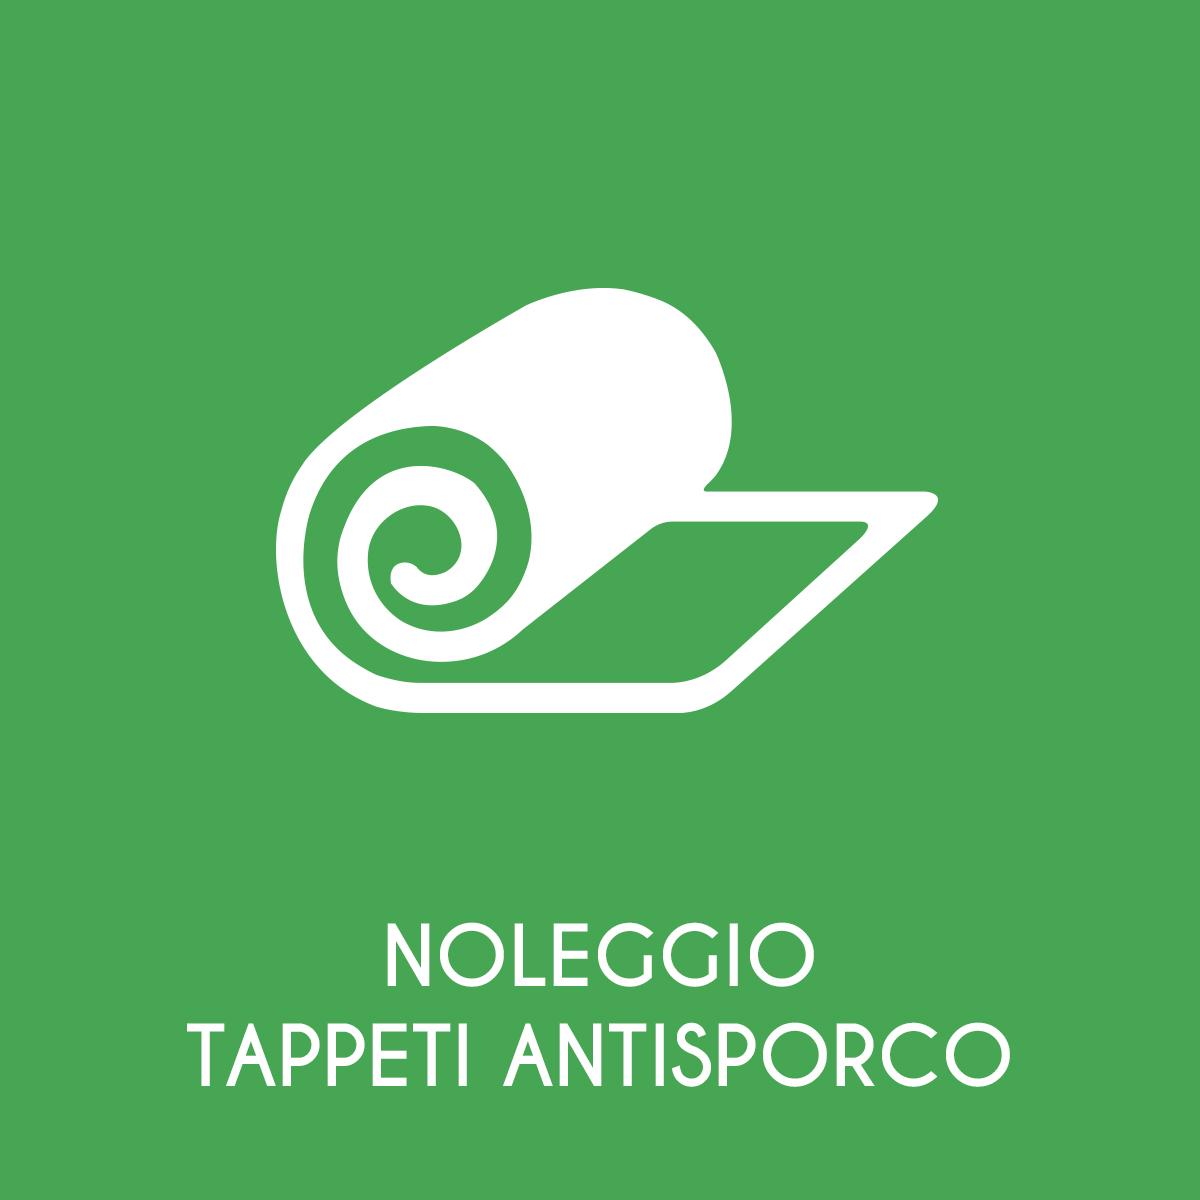 Noleggio Tappeti Antisporco